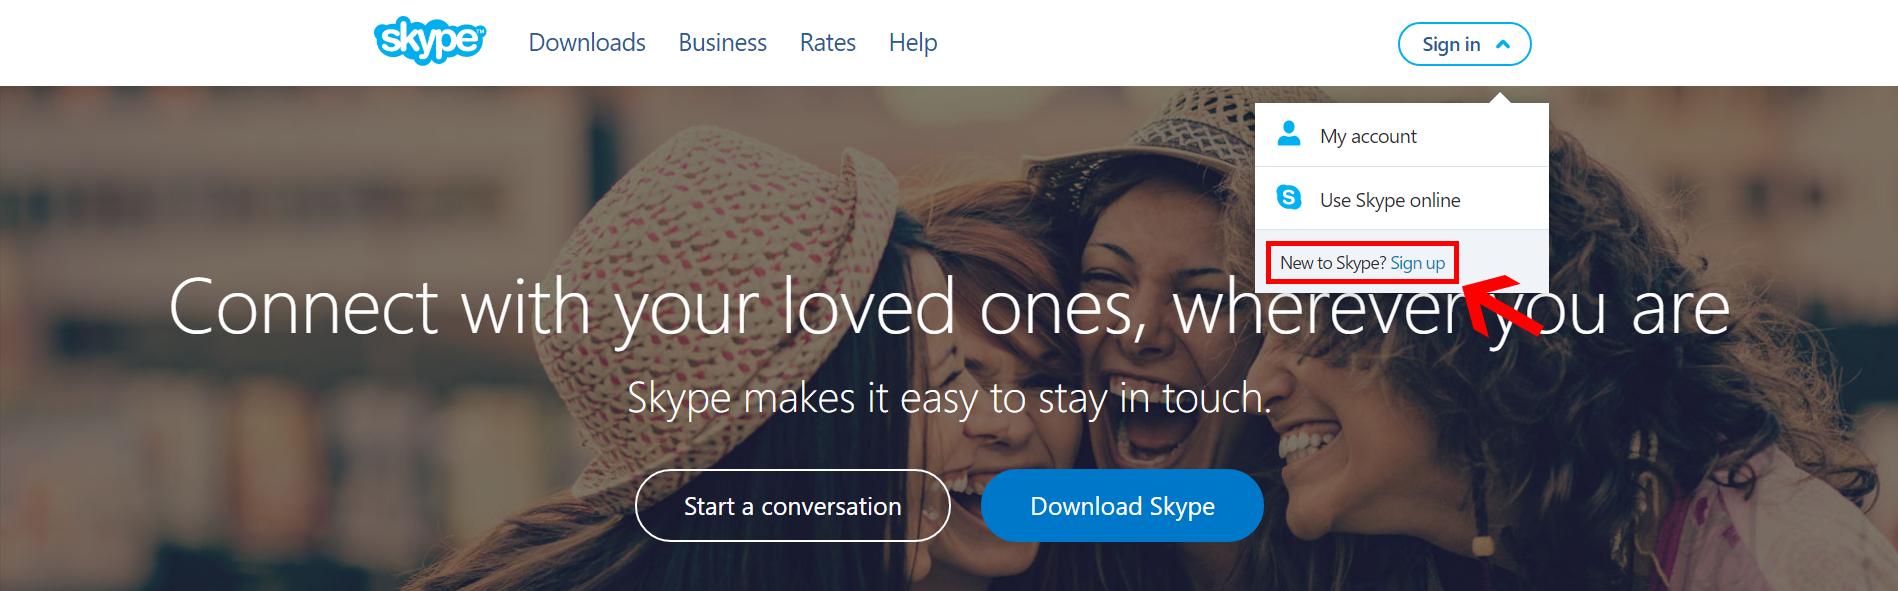 Skype ID webpage